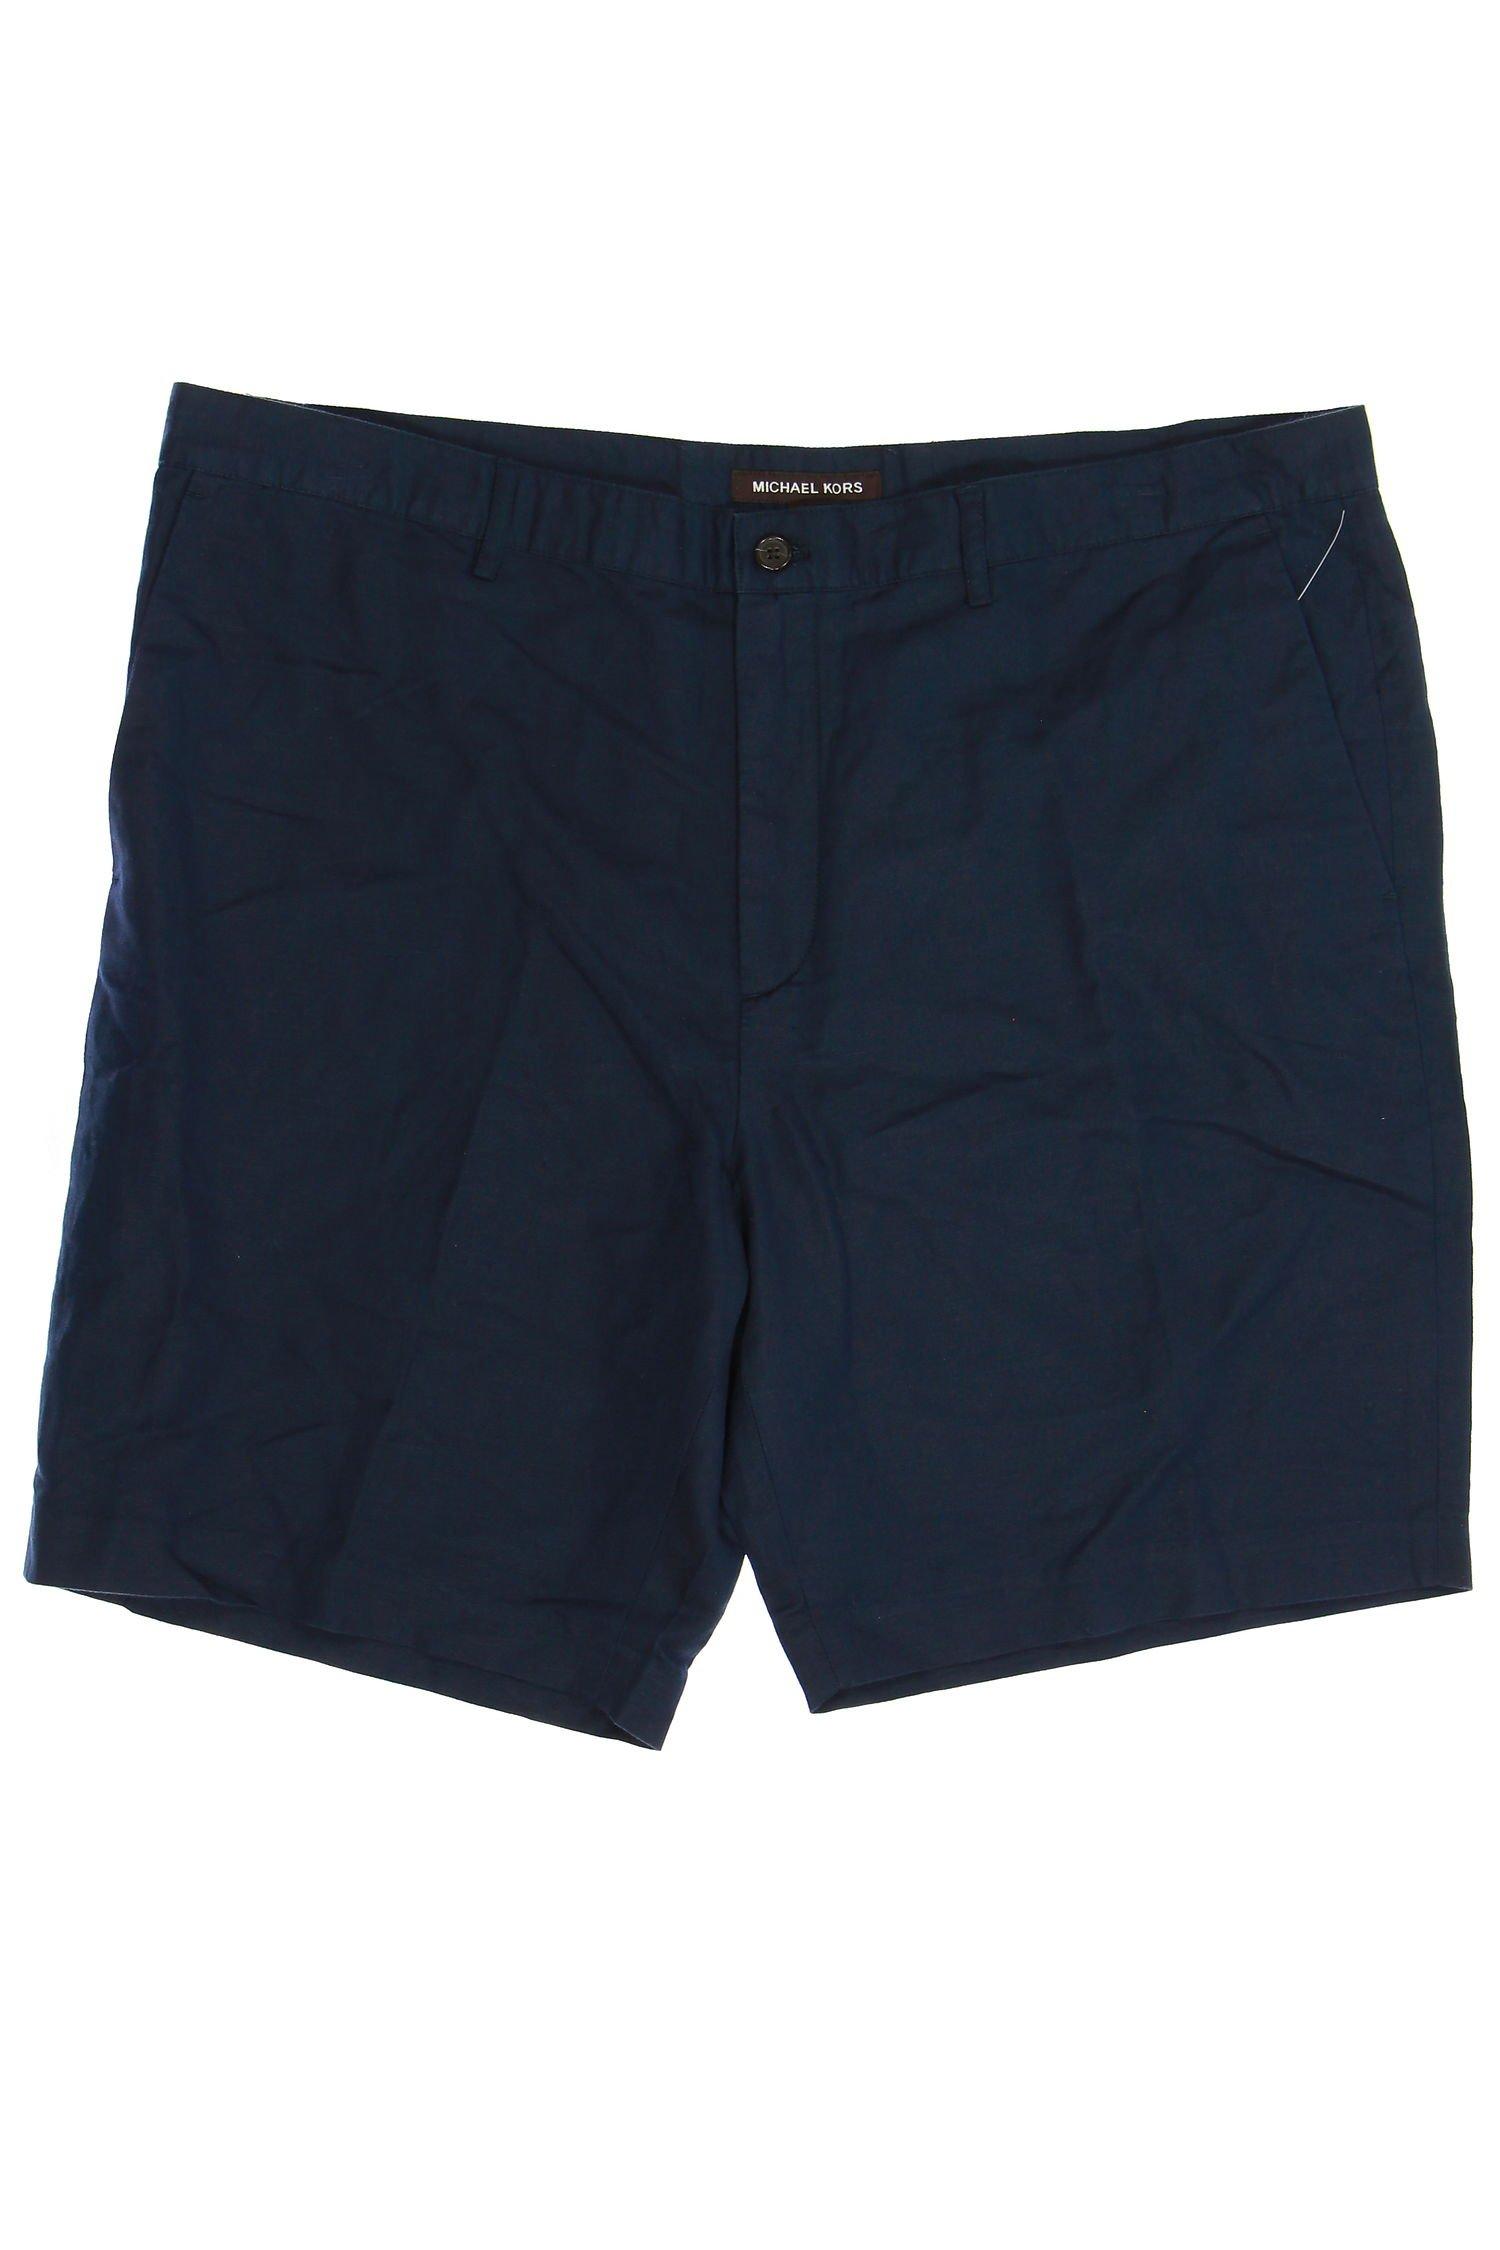 Michael Kors Flat Front Walking Shorts (38, Blue)